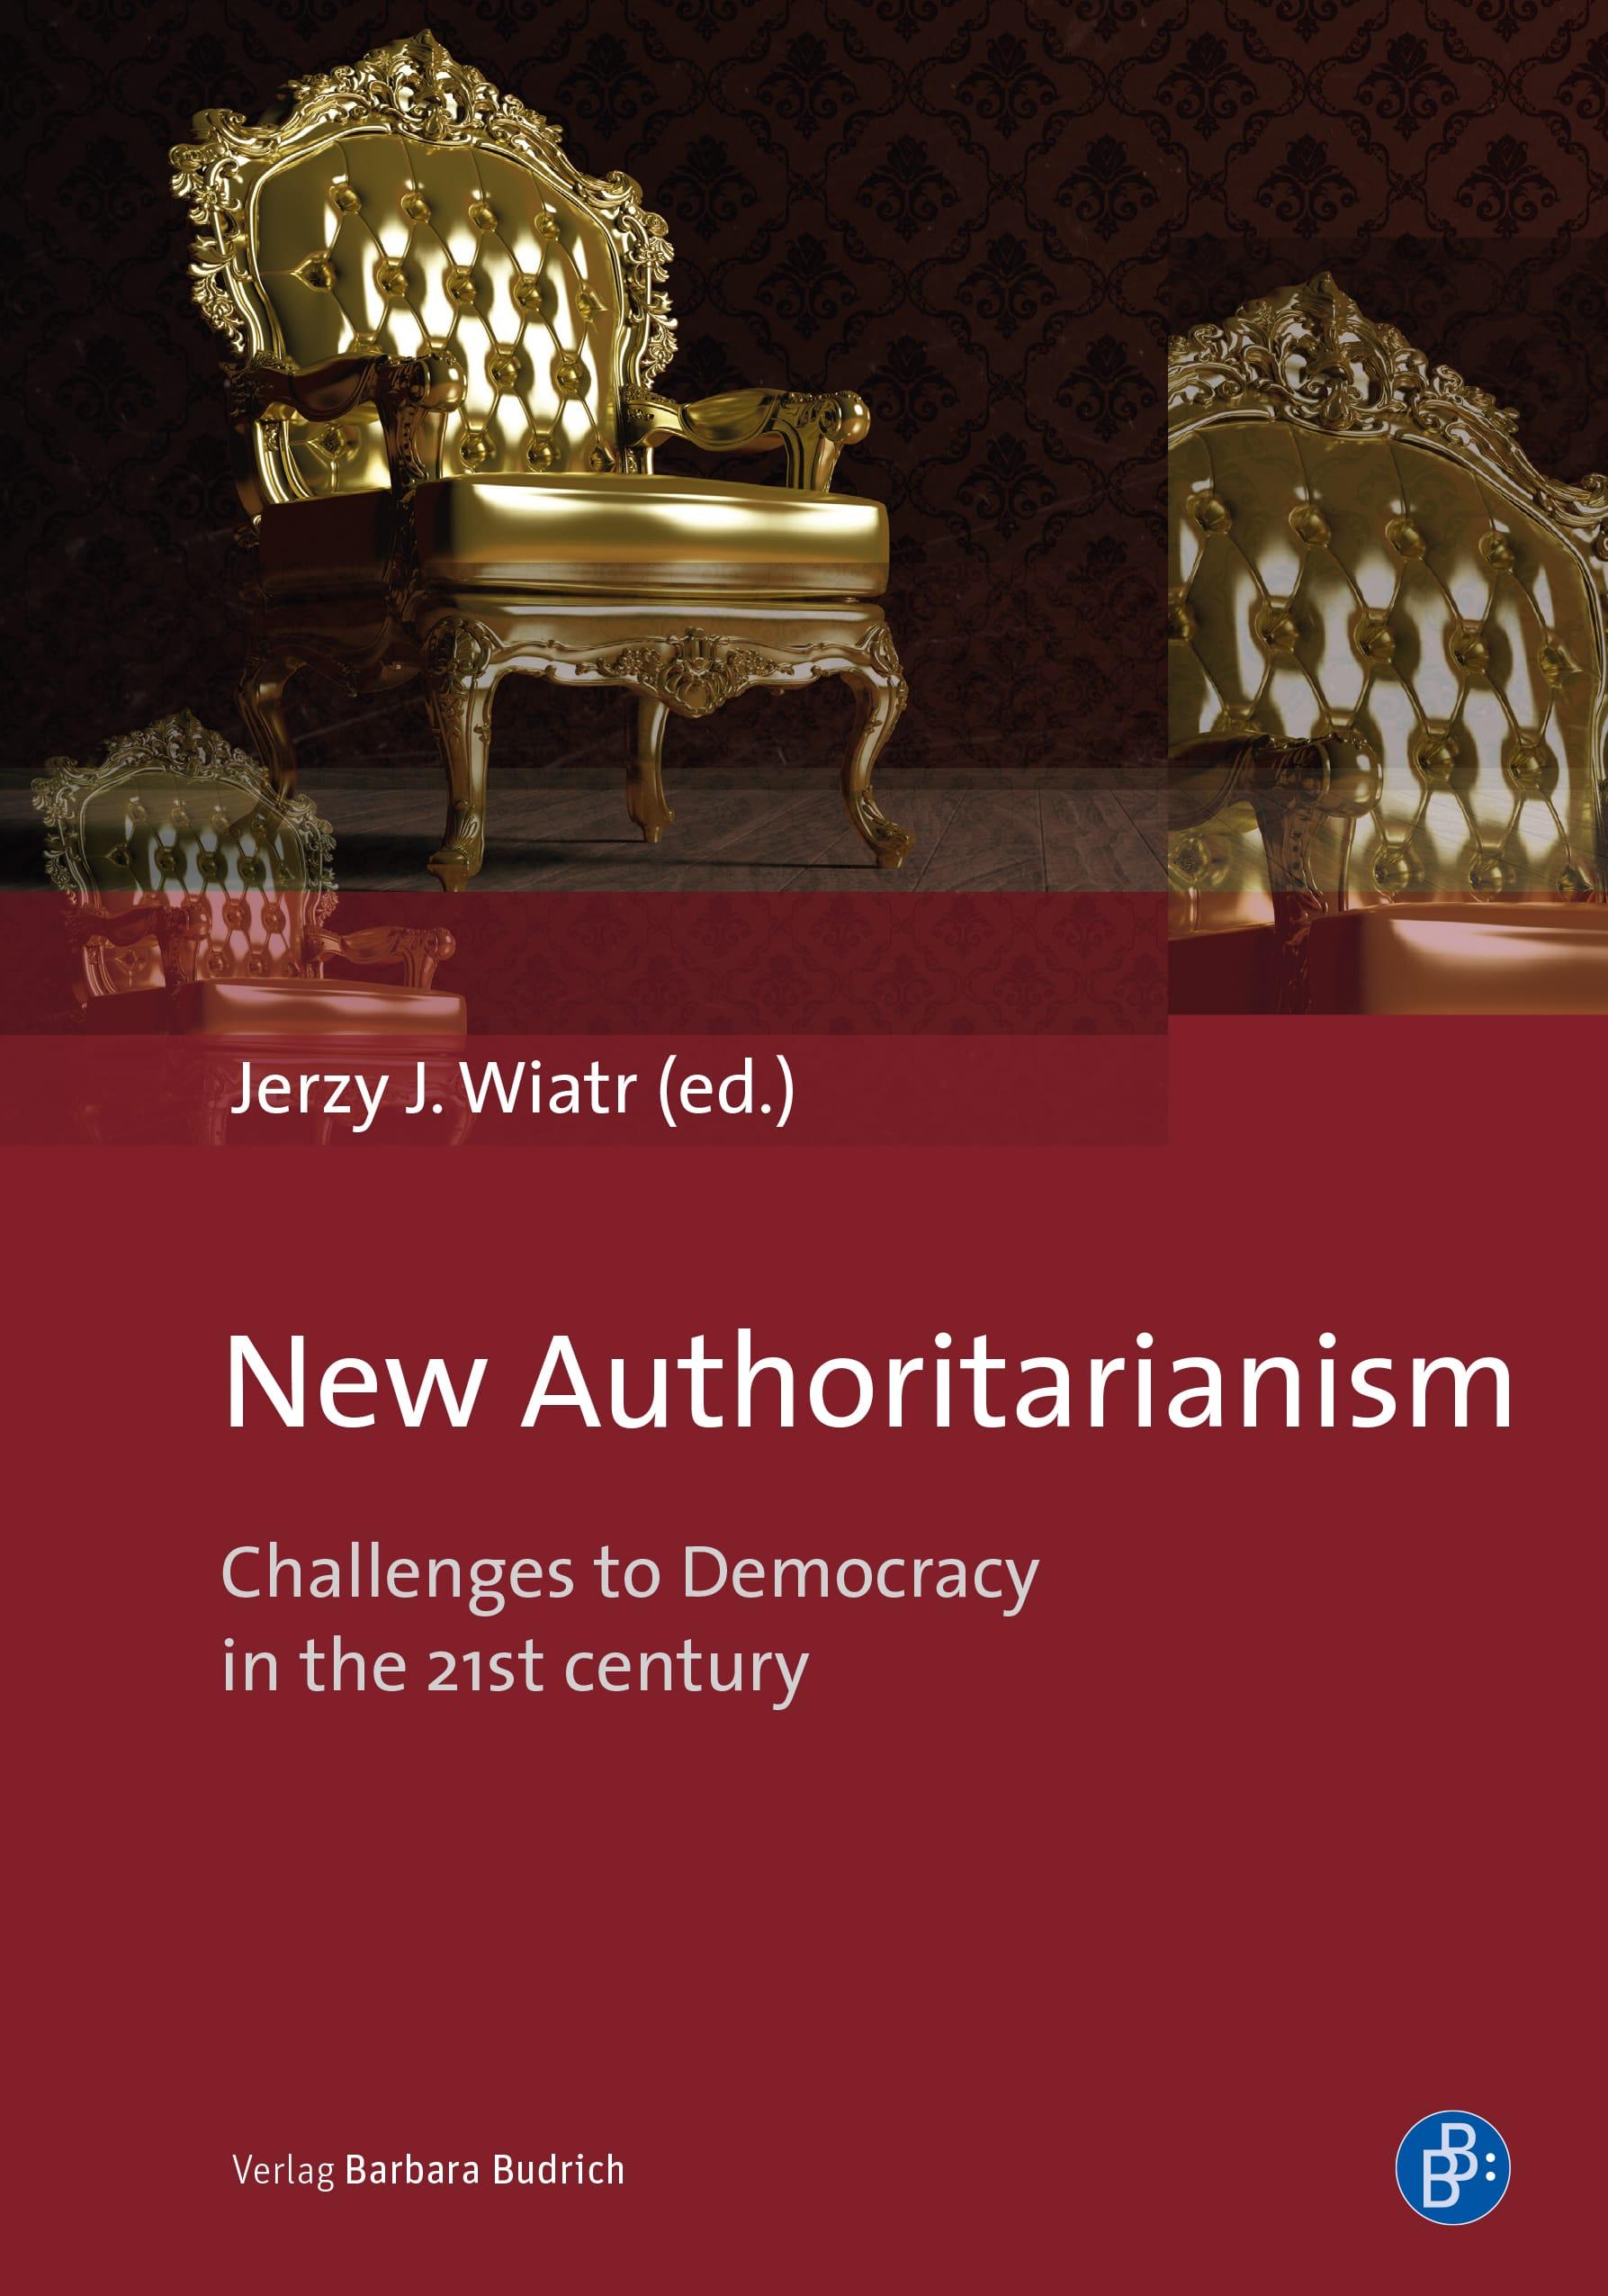 New Authoritarianism